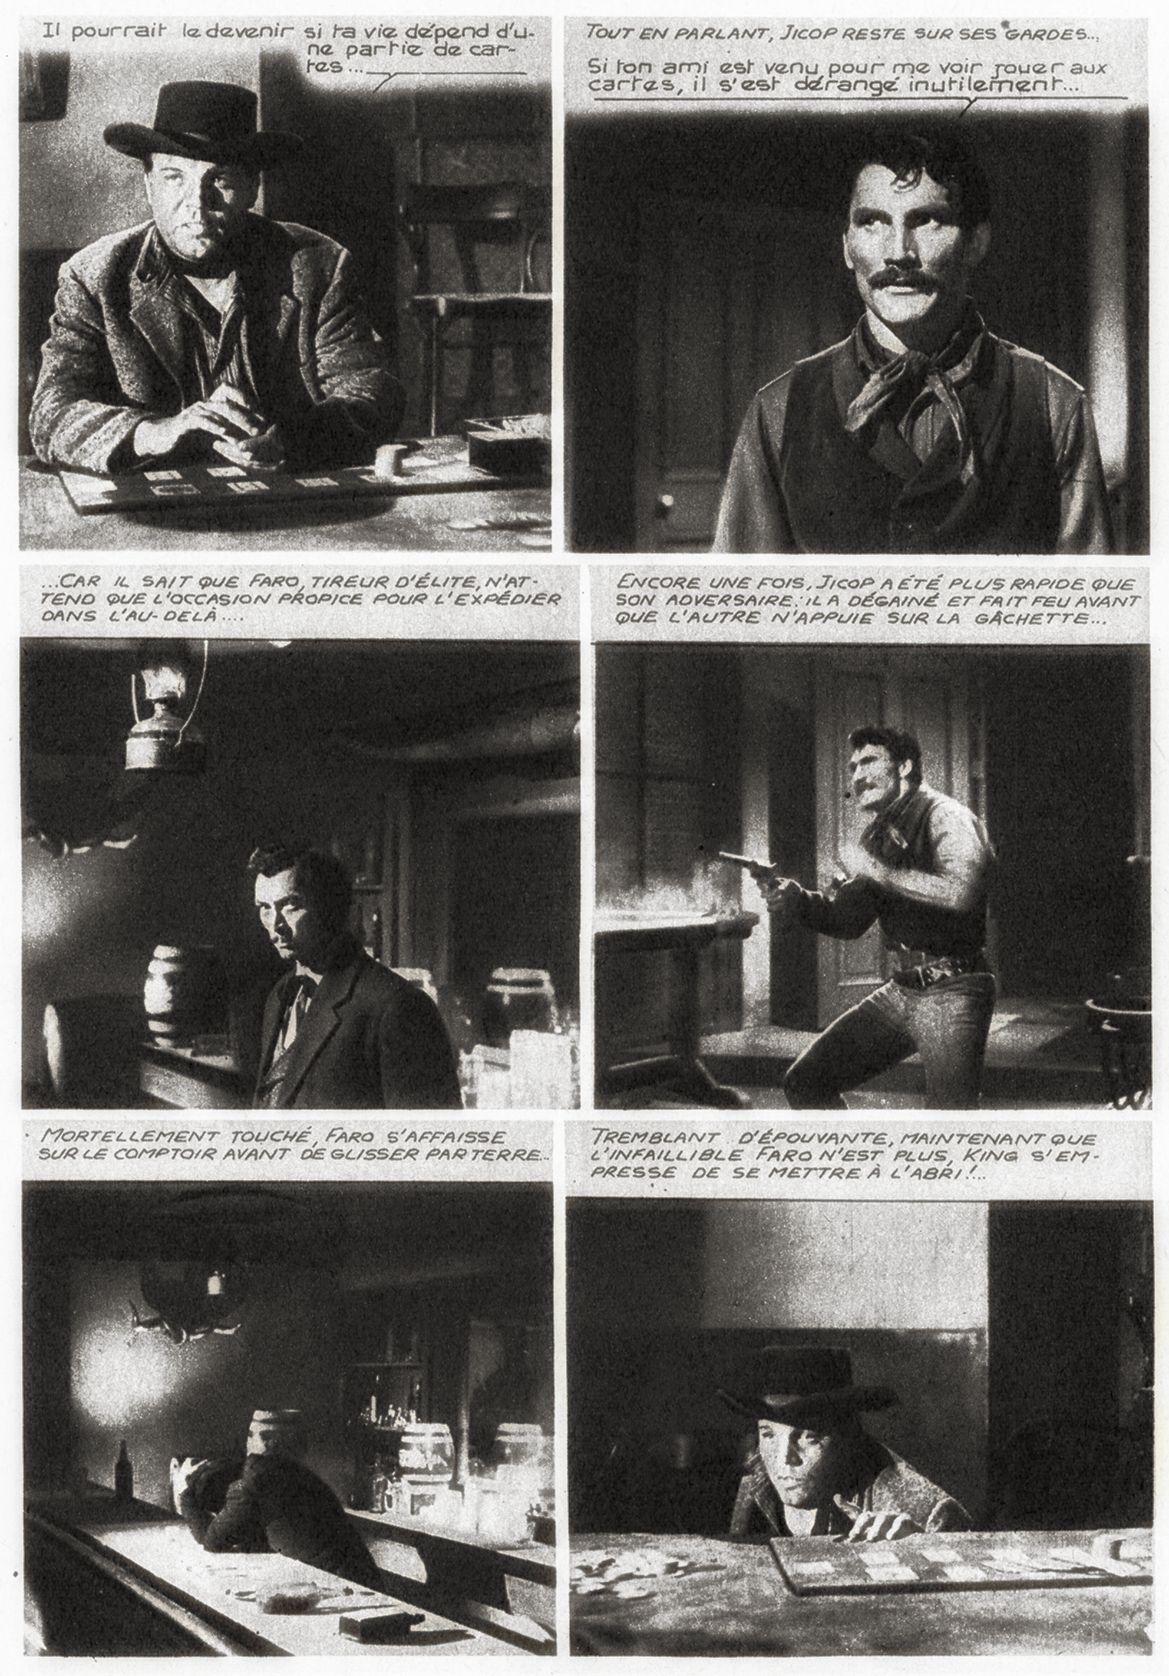 Jack Palance Filmes Delightful les films de lee van cleef | blog du west 2 | page 5